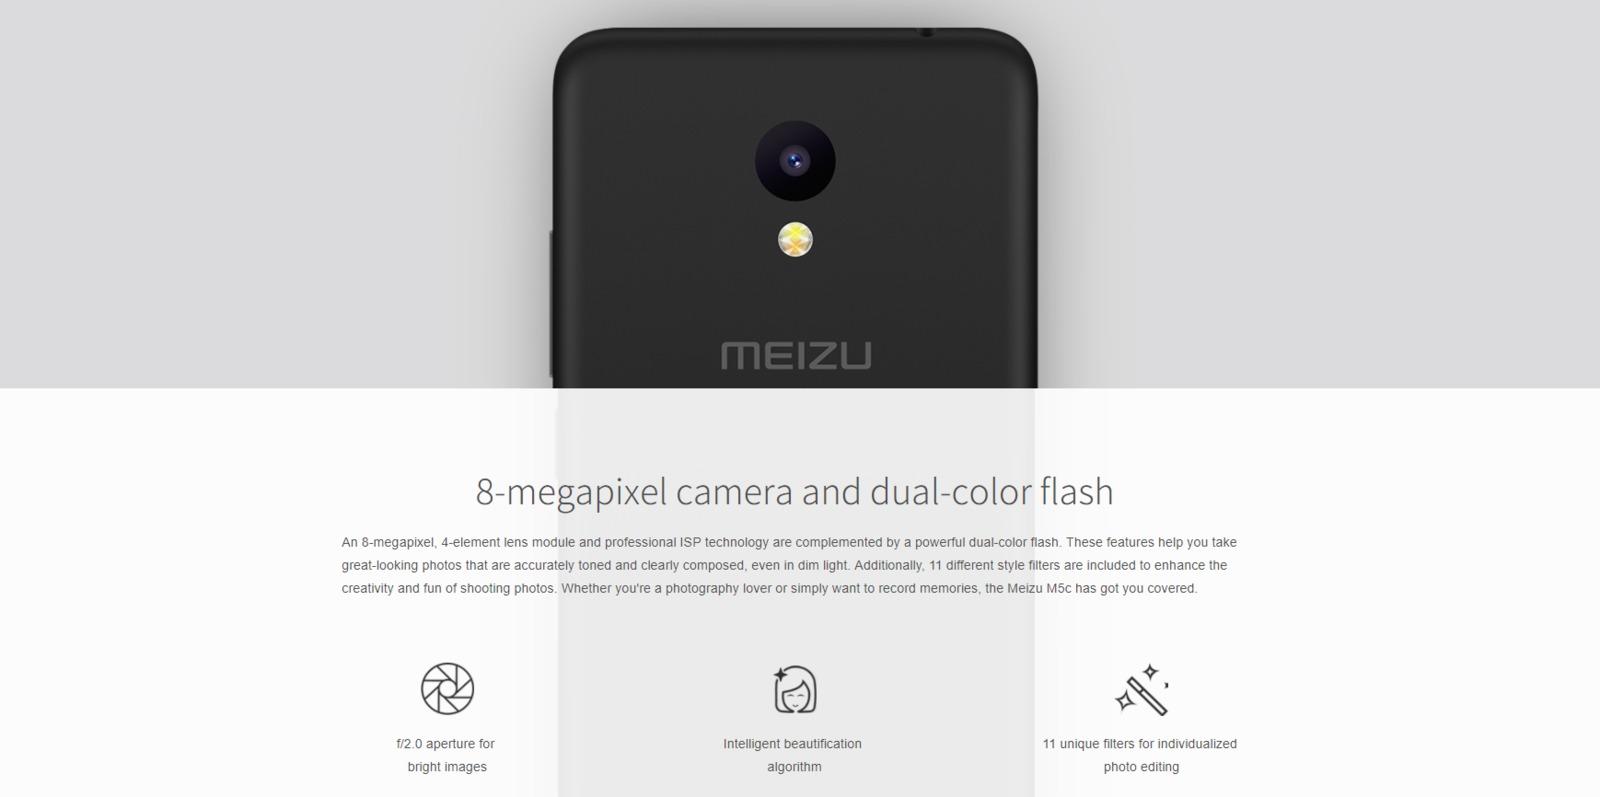 MEIZU M5c Smartphone 16GB - Black image